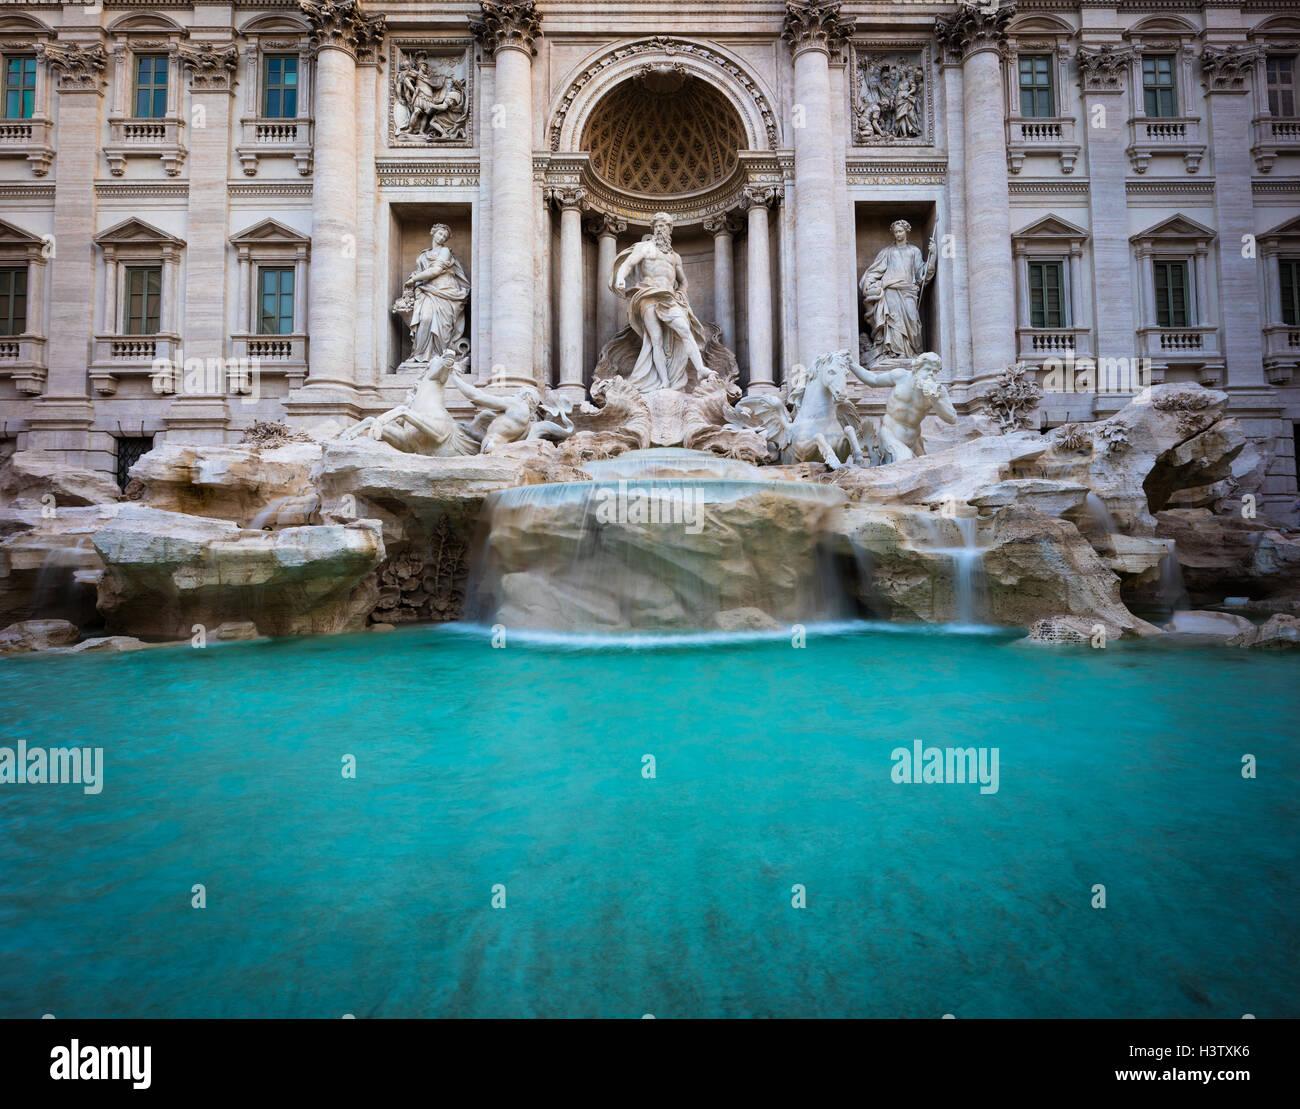 Italiano: la Fontana de Trevi (Fontana di Trevi) es un distrito en la Fontana de Trevi en Roma, Italia Foto de stock